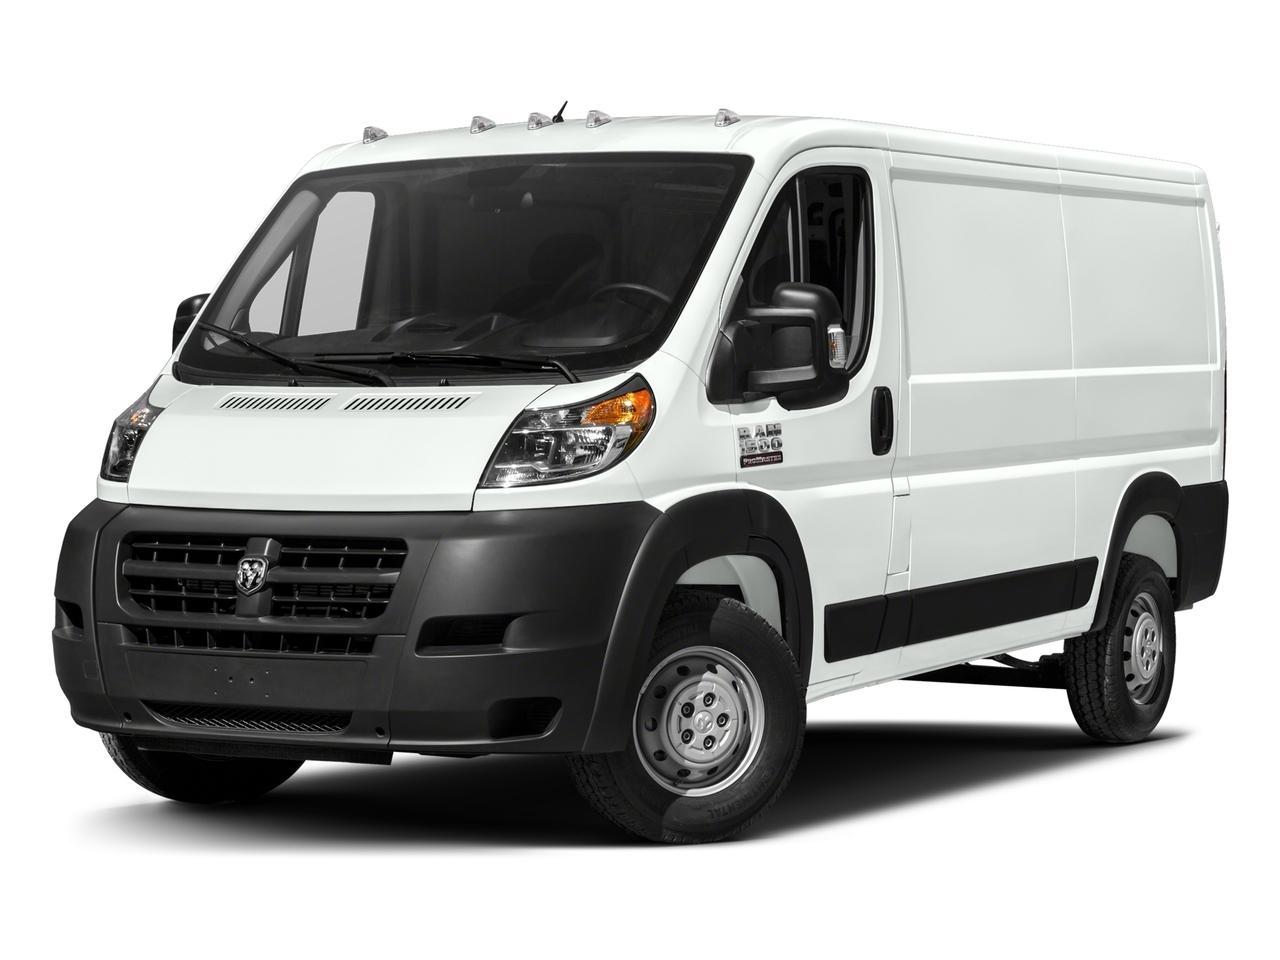 2018 Ram ProMaster Cargo Van Vehicle Photo in PORTLAND, OR 97225-3518